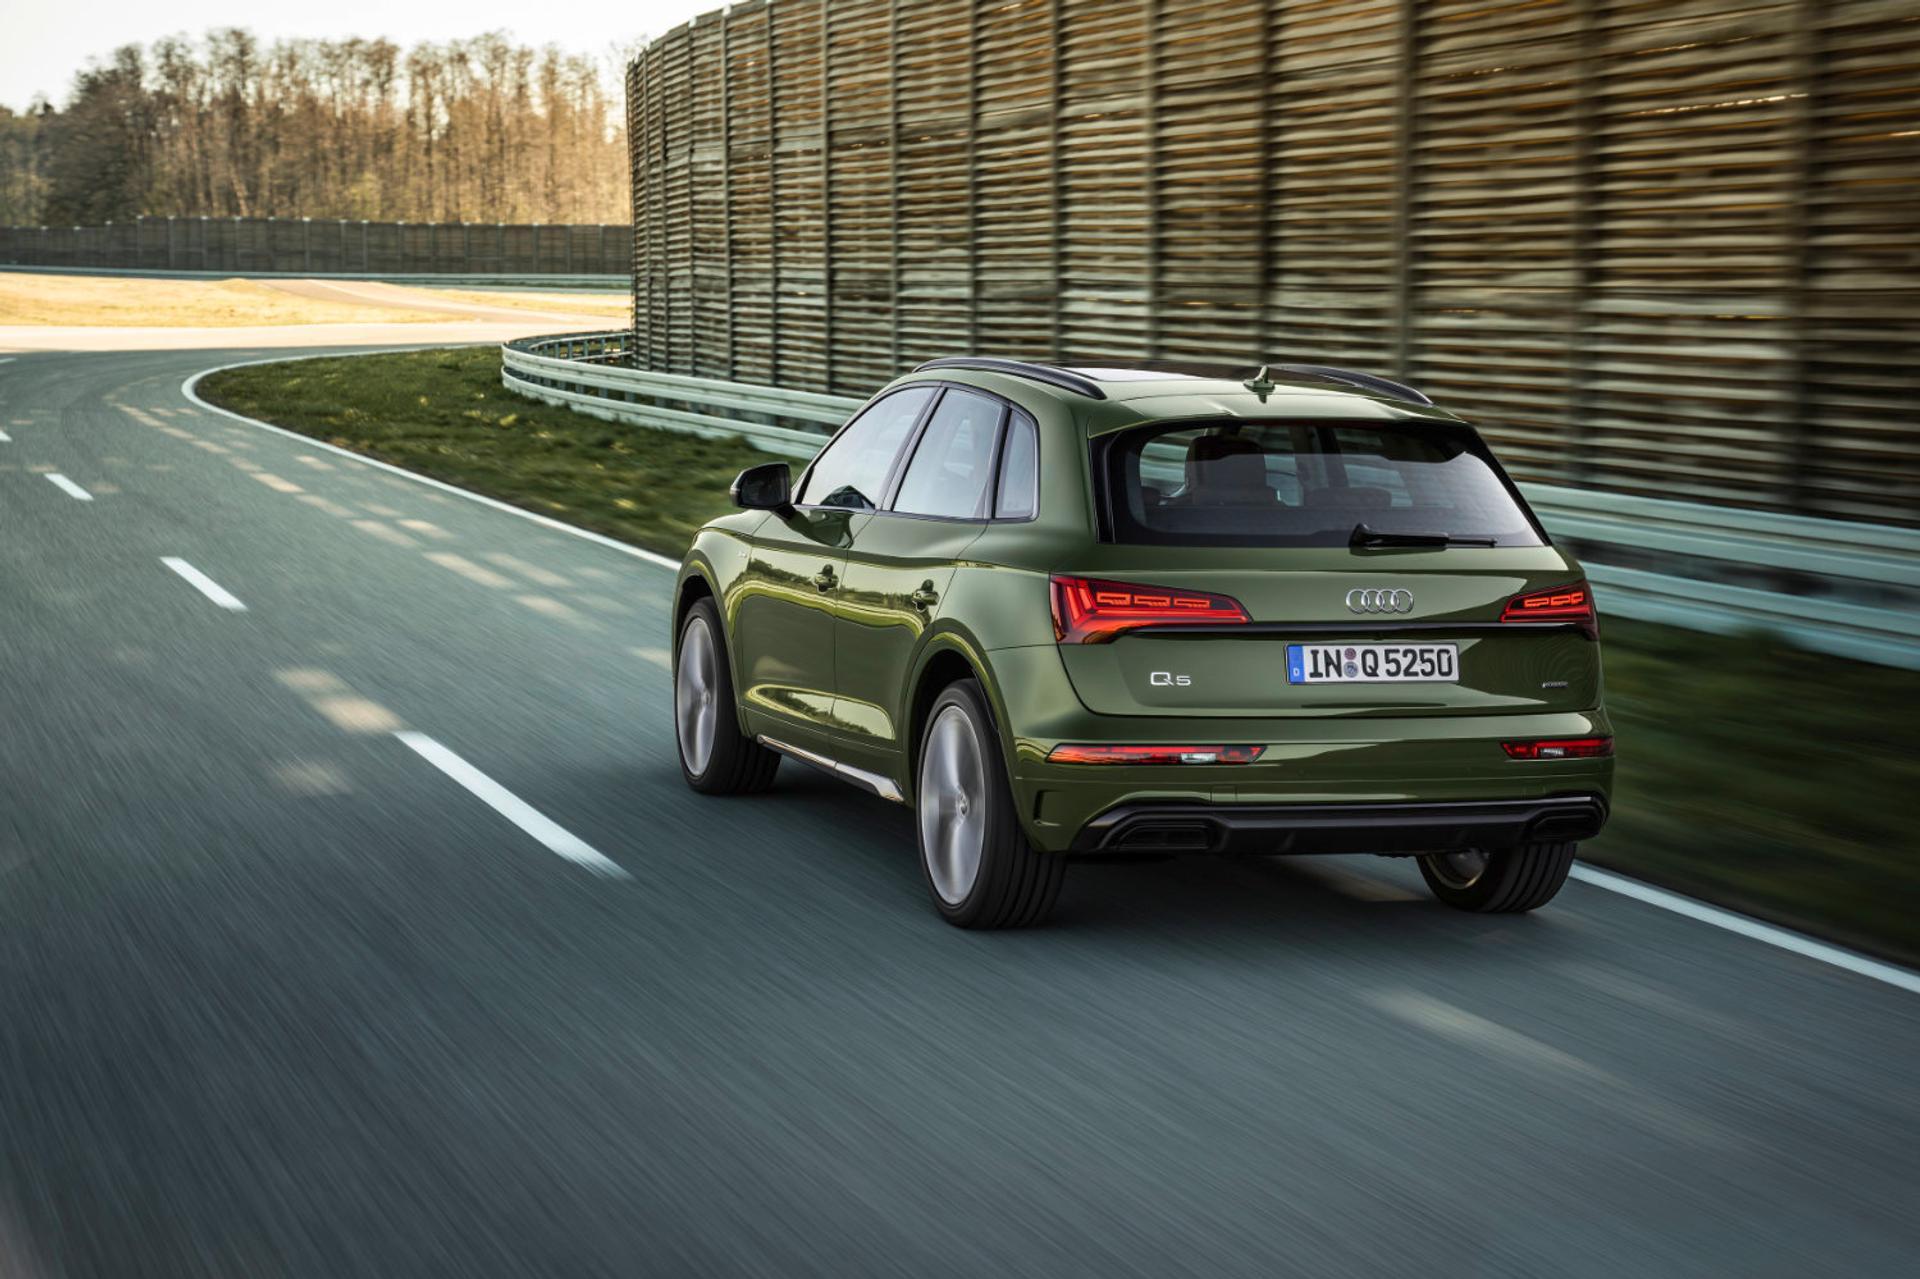 Audi Q5 driving rear view